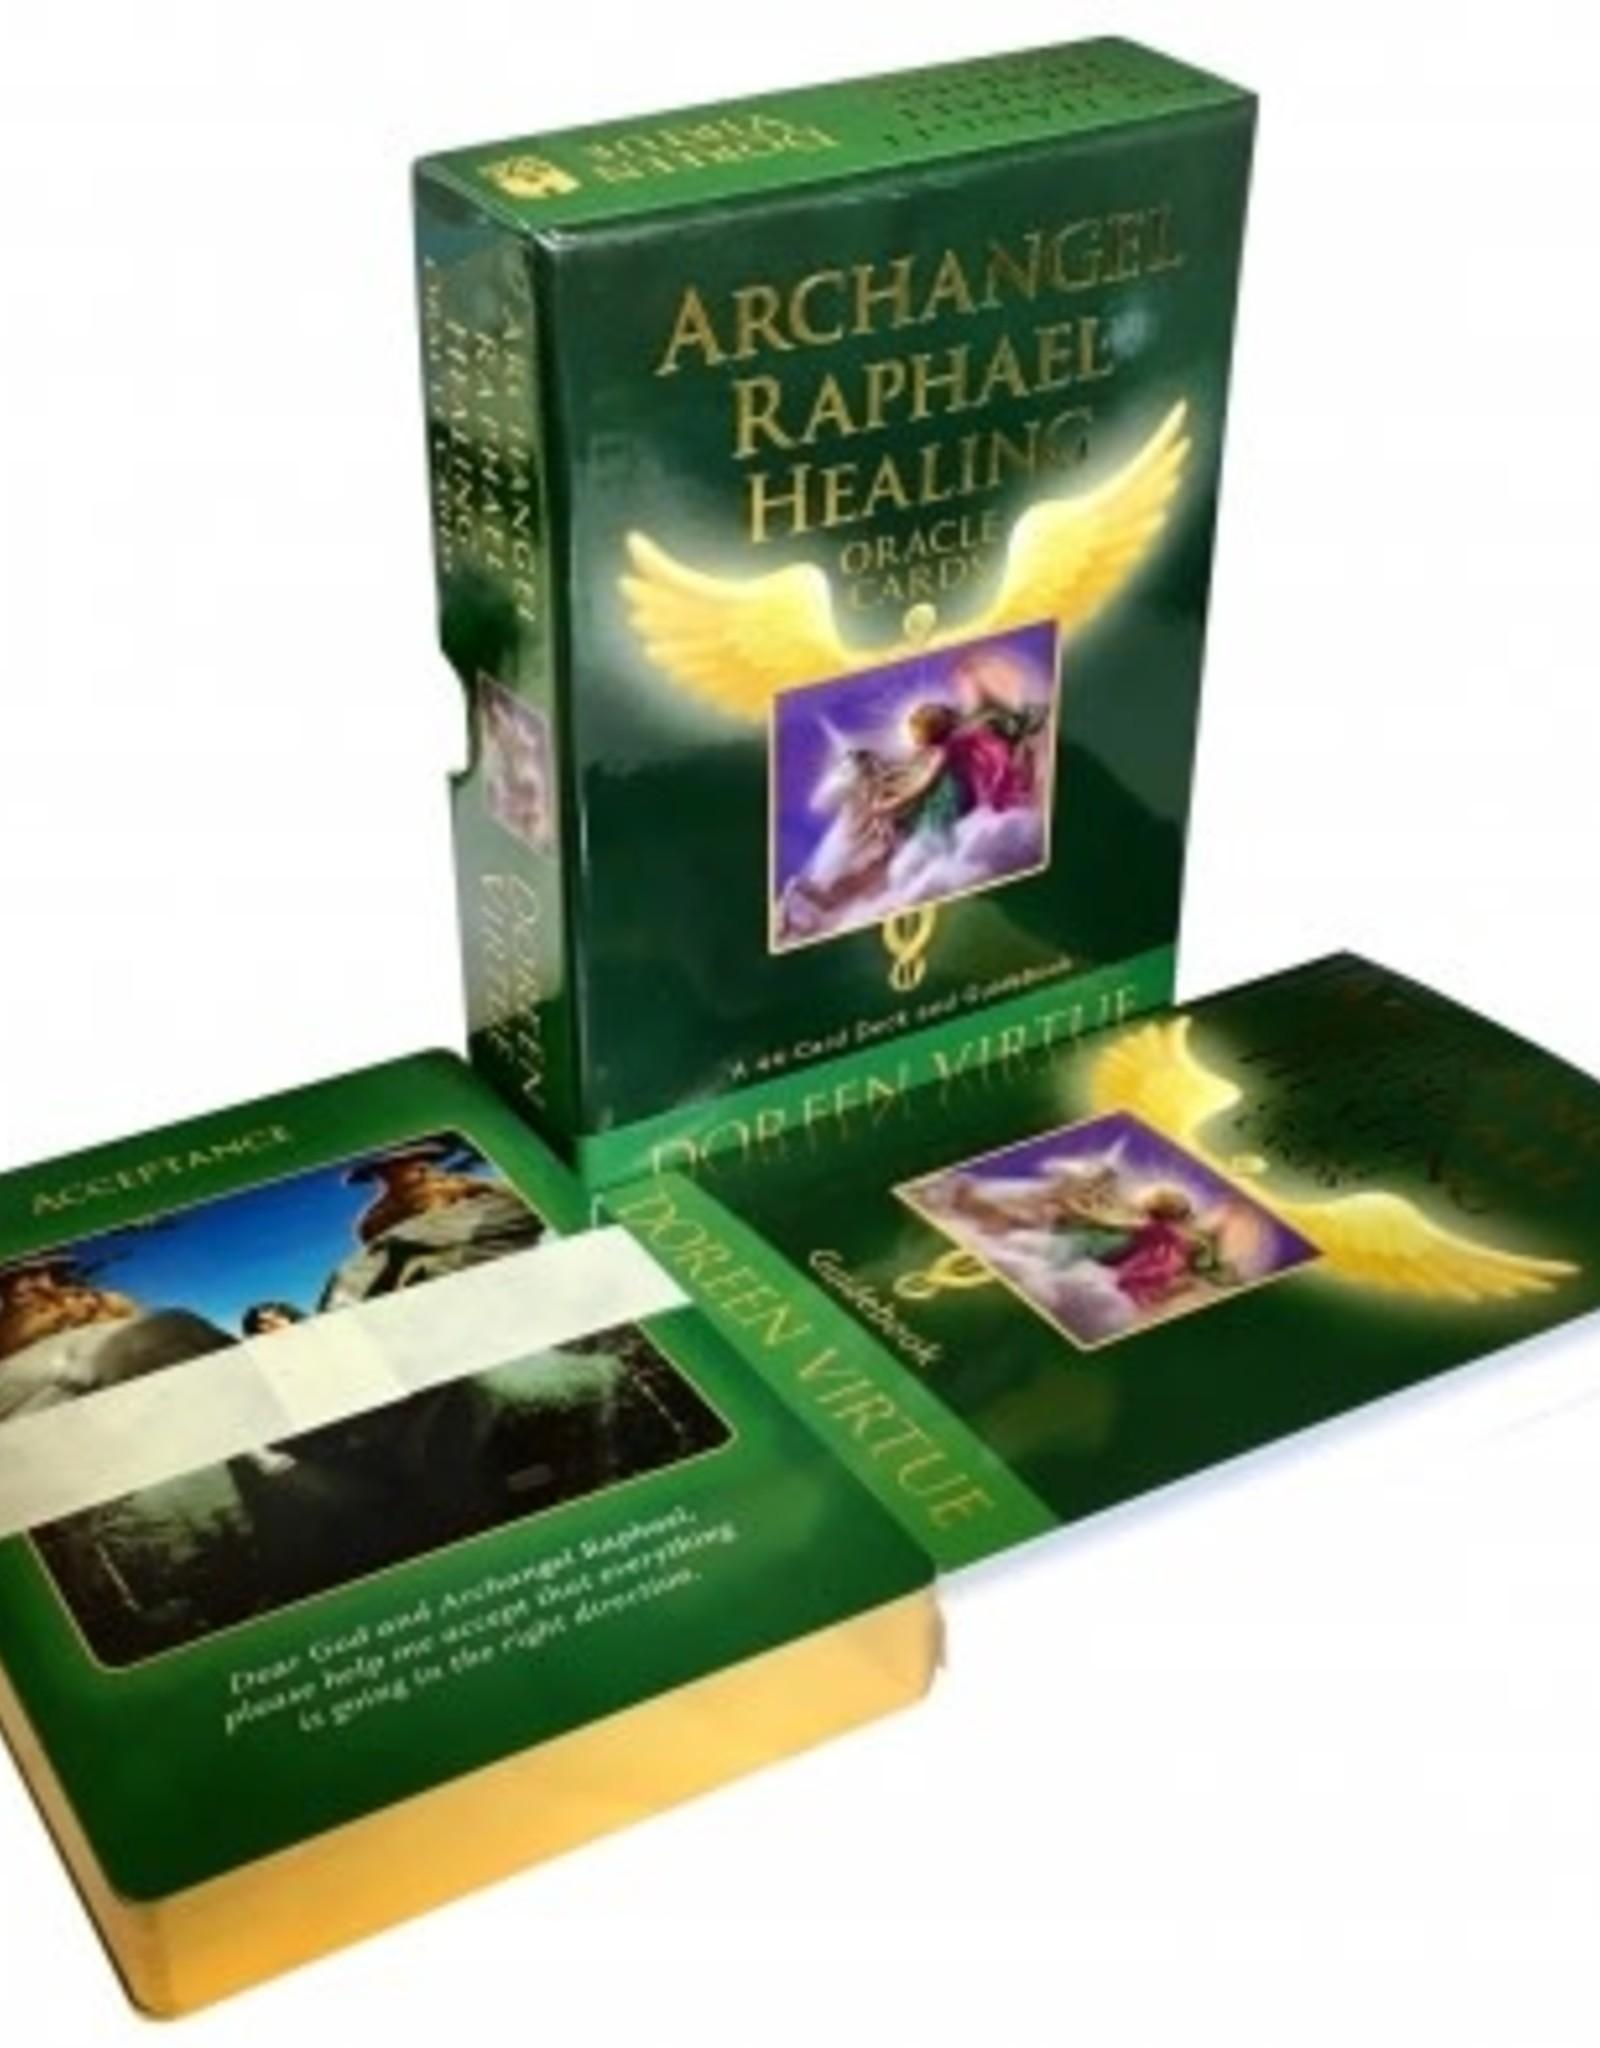 Doreen Virtue Archangel Raphael Healing Oracle by Doreen Virtue